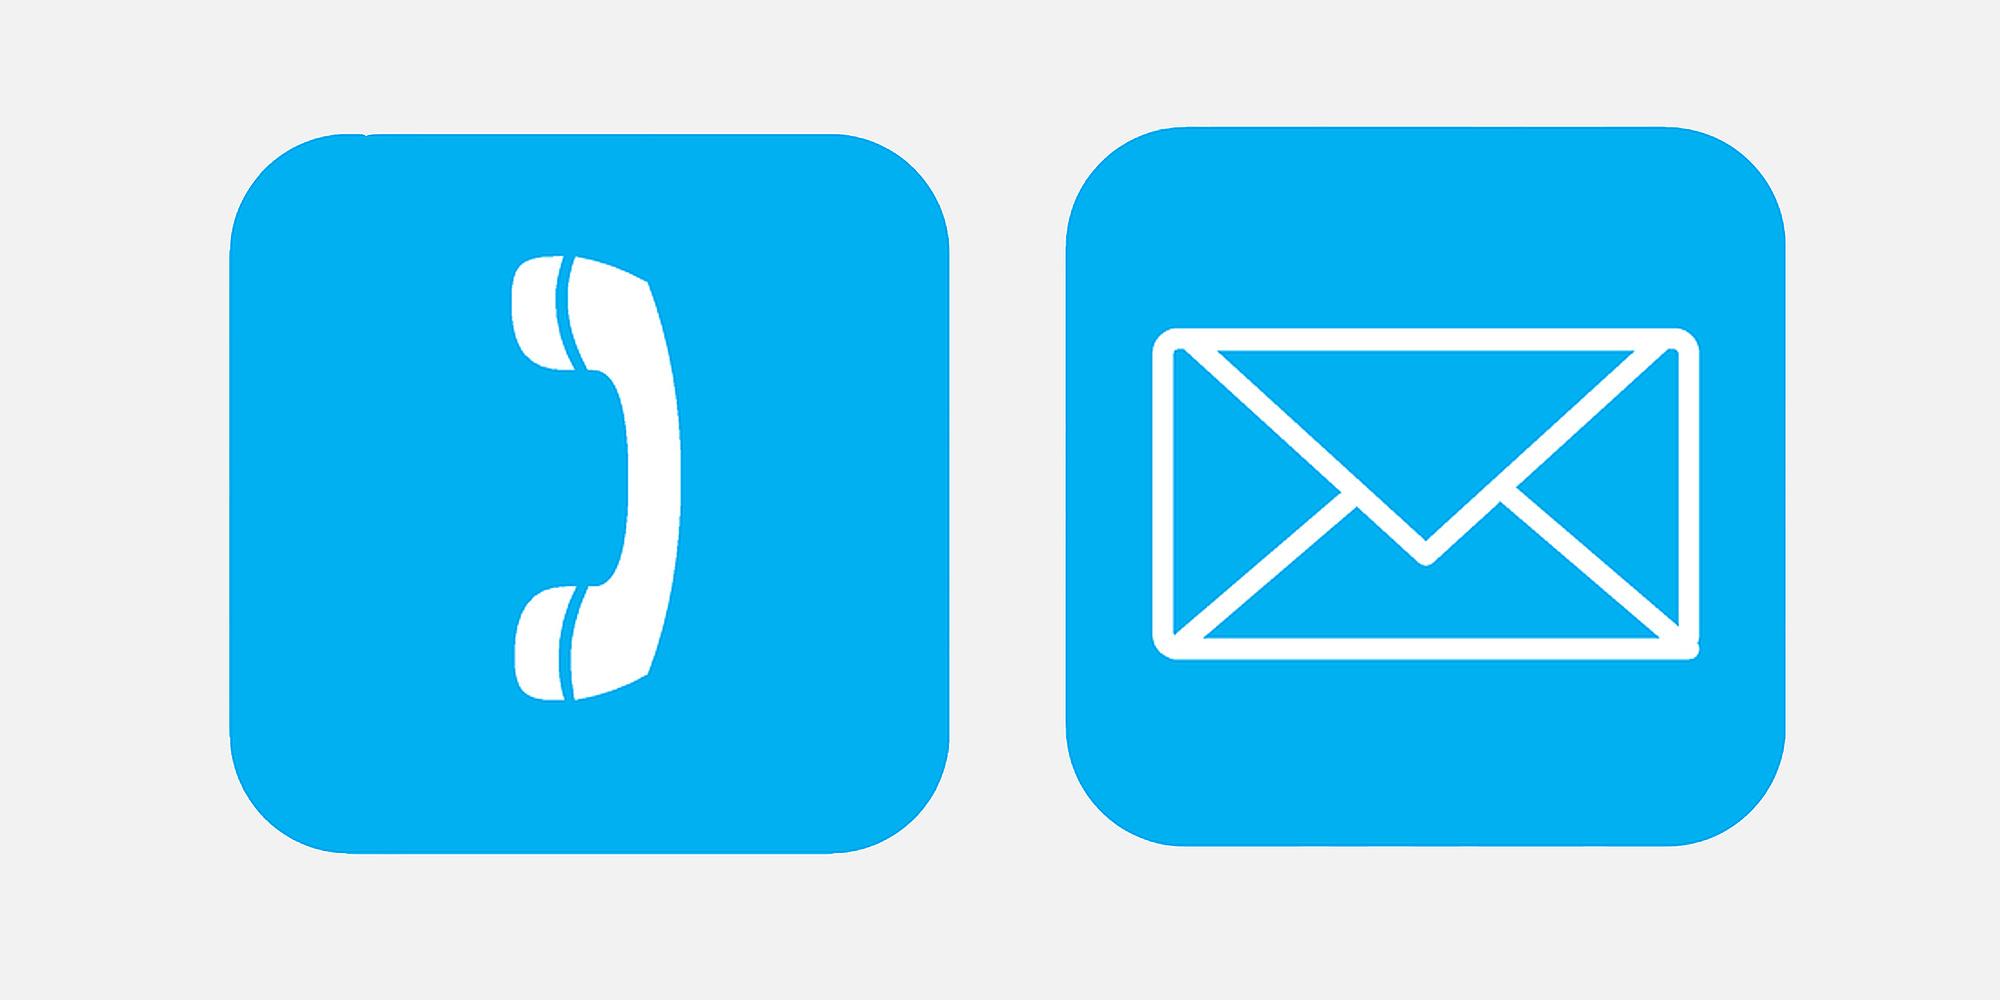 Icons Telefon und Mail